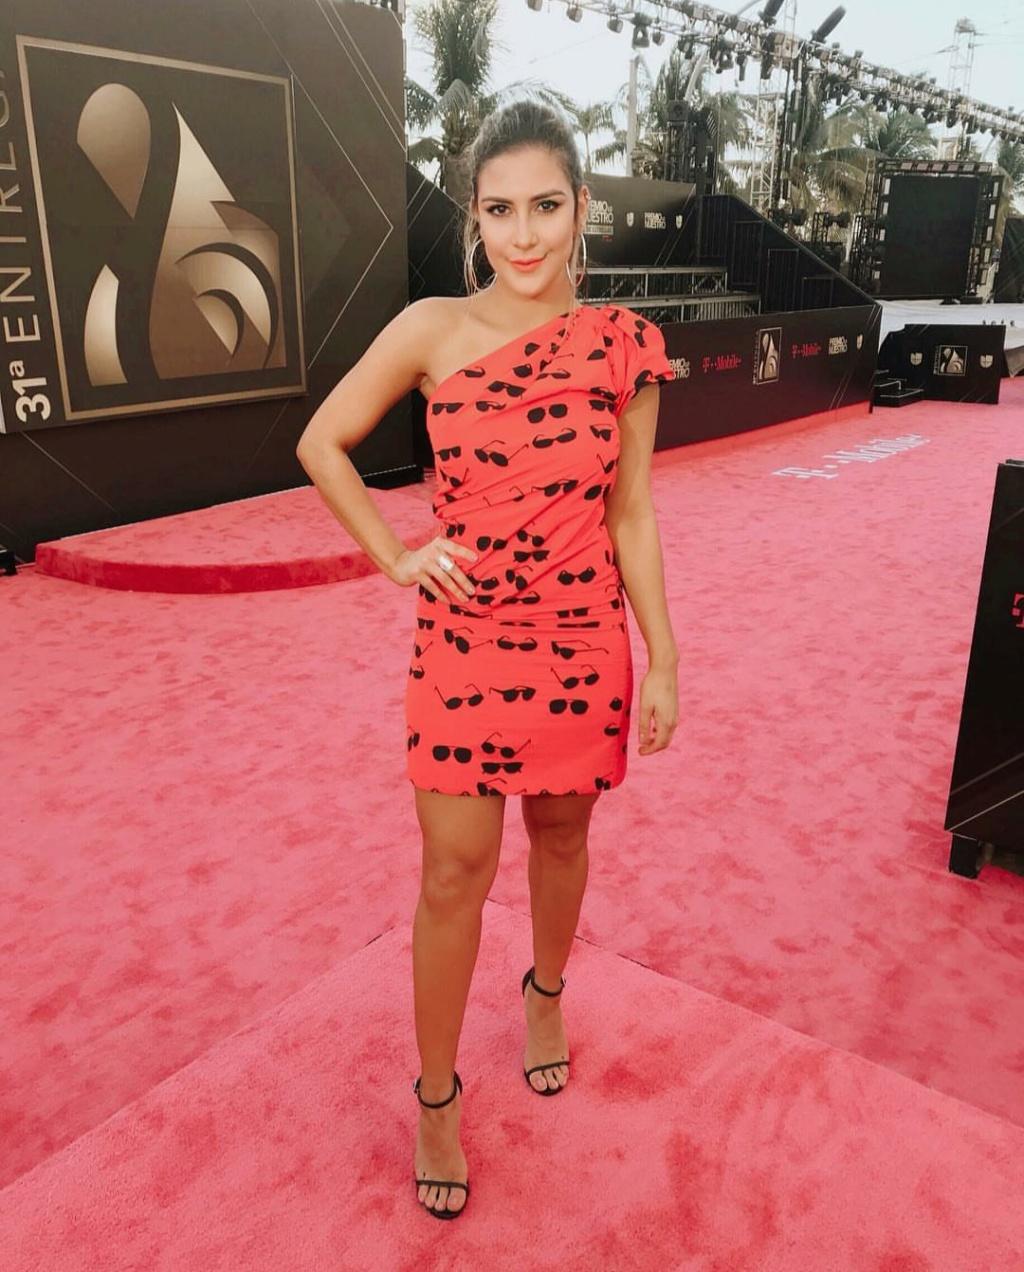 ¿Cuánto mide Jessica Rodríguez? - Real height Img_2219